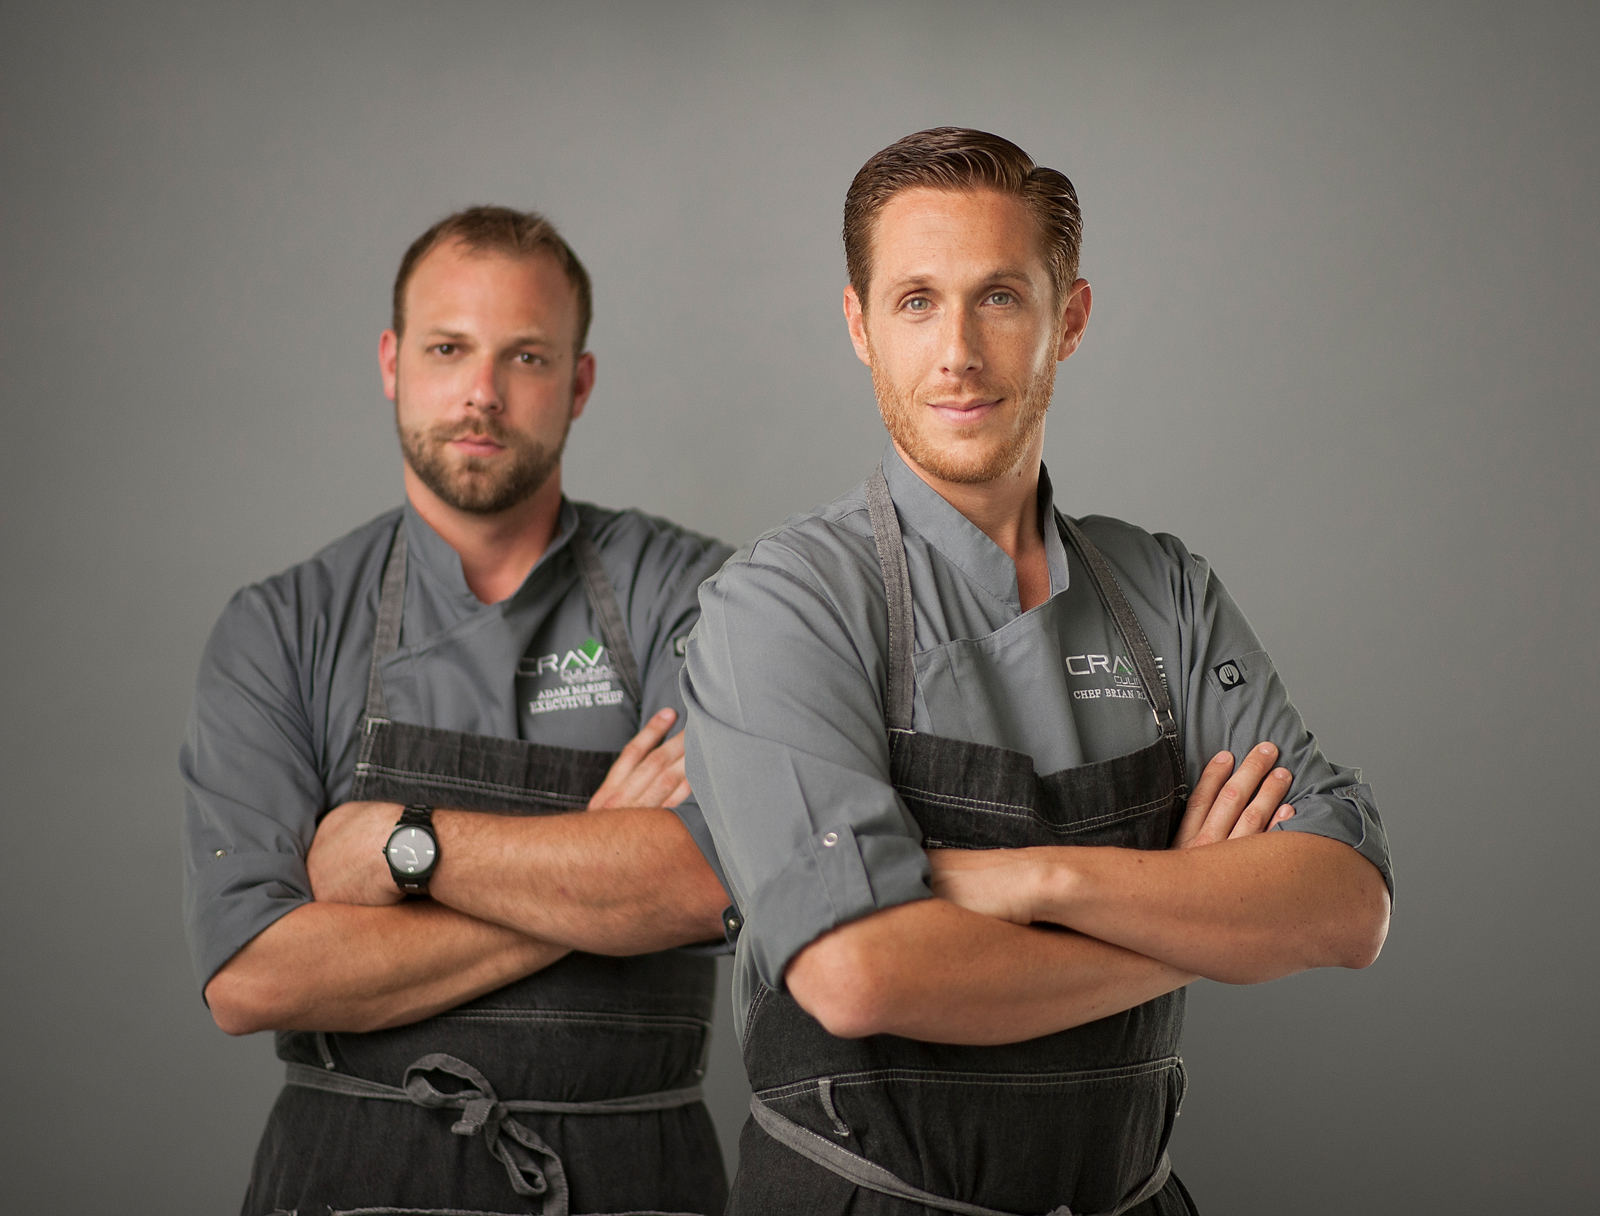 01-chef-team-two-men-attitude-pose-arms-crossed-dramatic-branding-naples-heashots.jpg